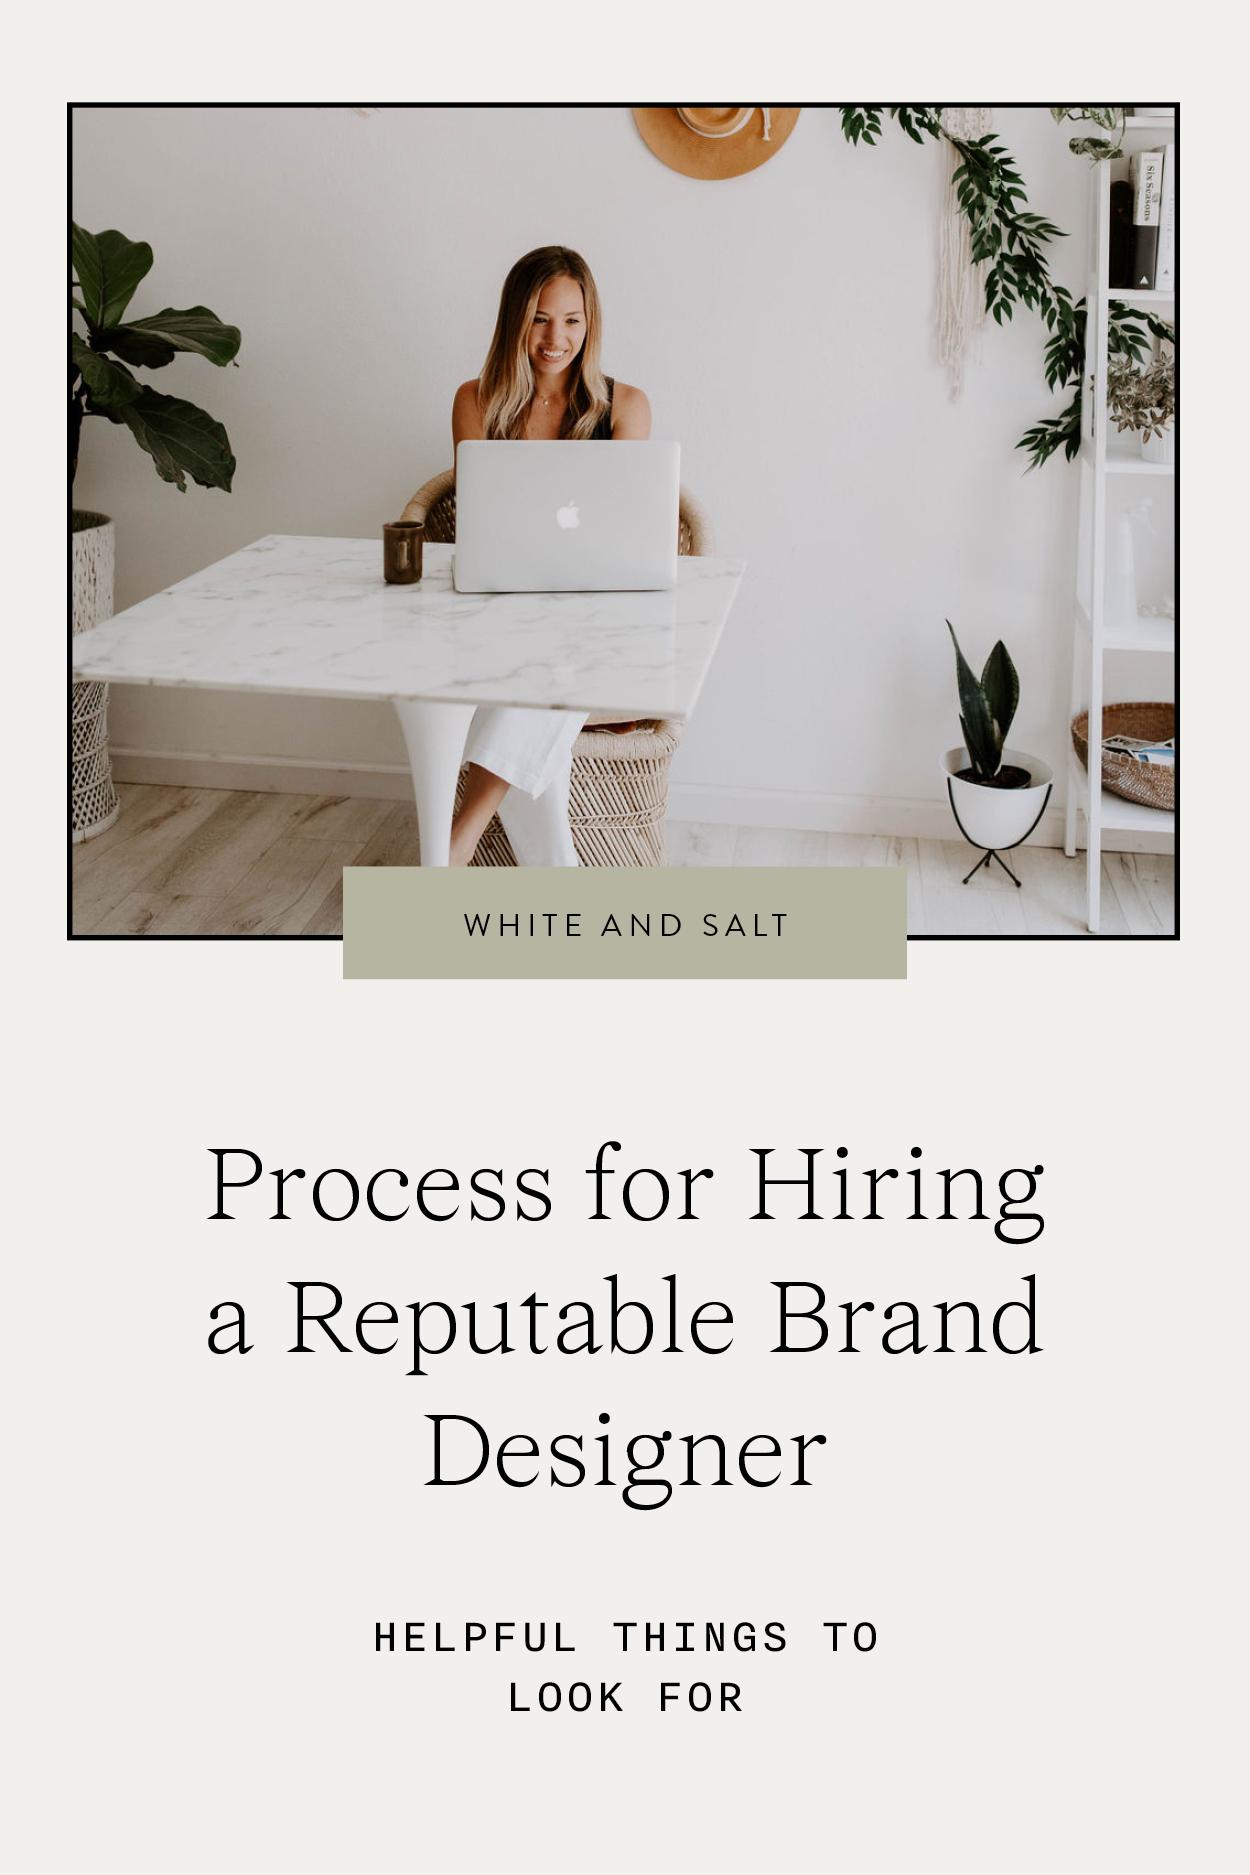 Process for Hiring a Reputable Brand Designer.jpg